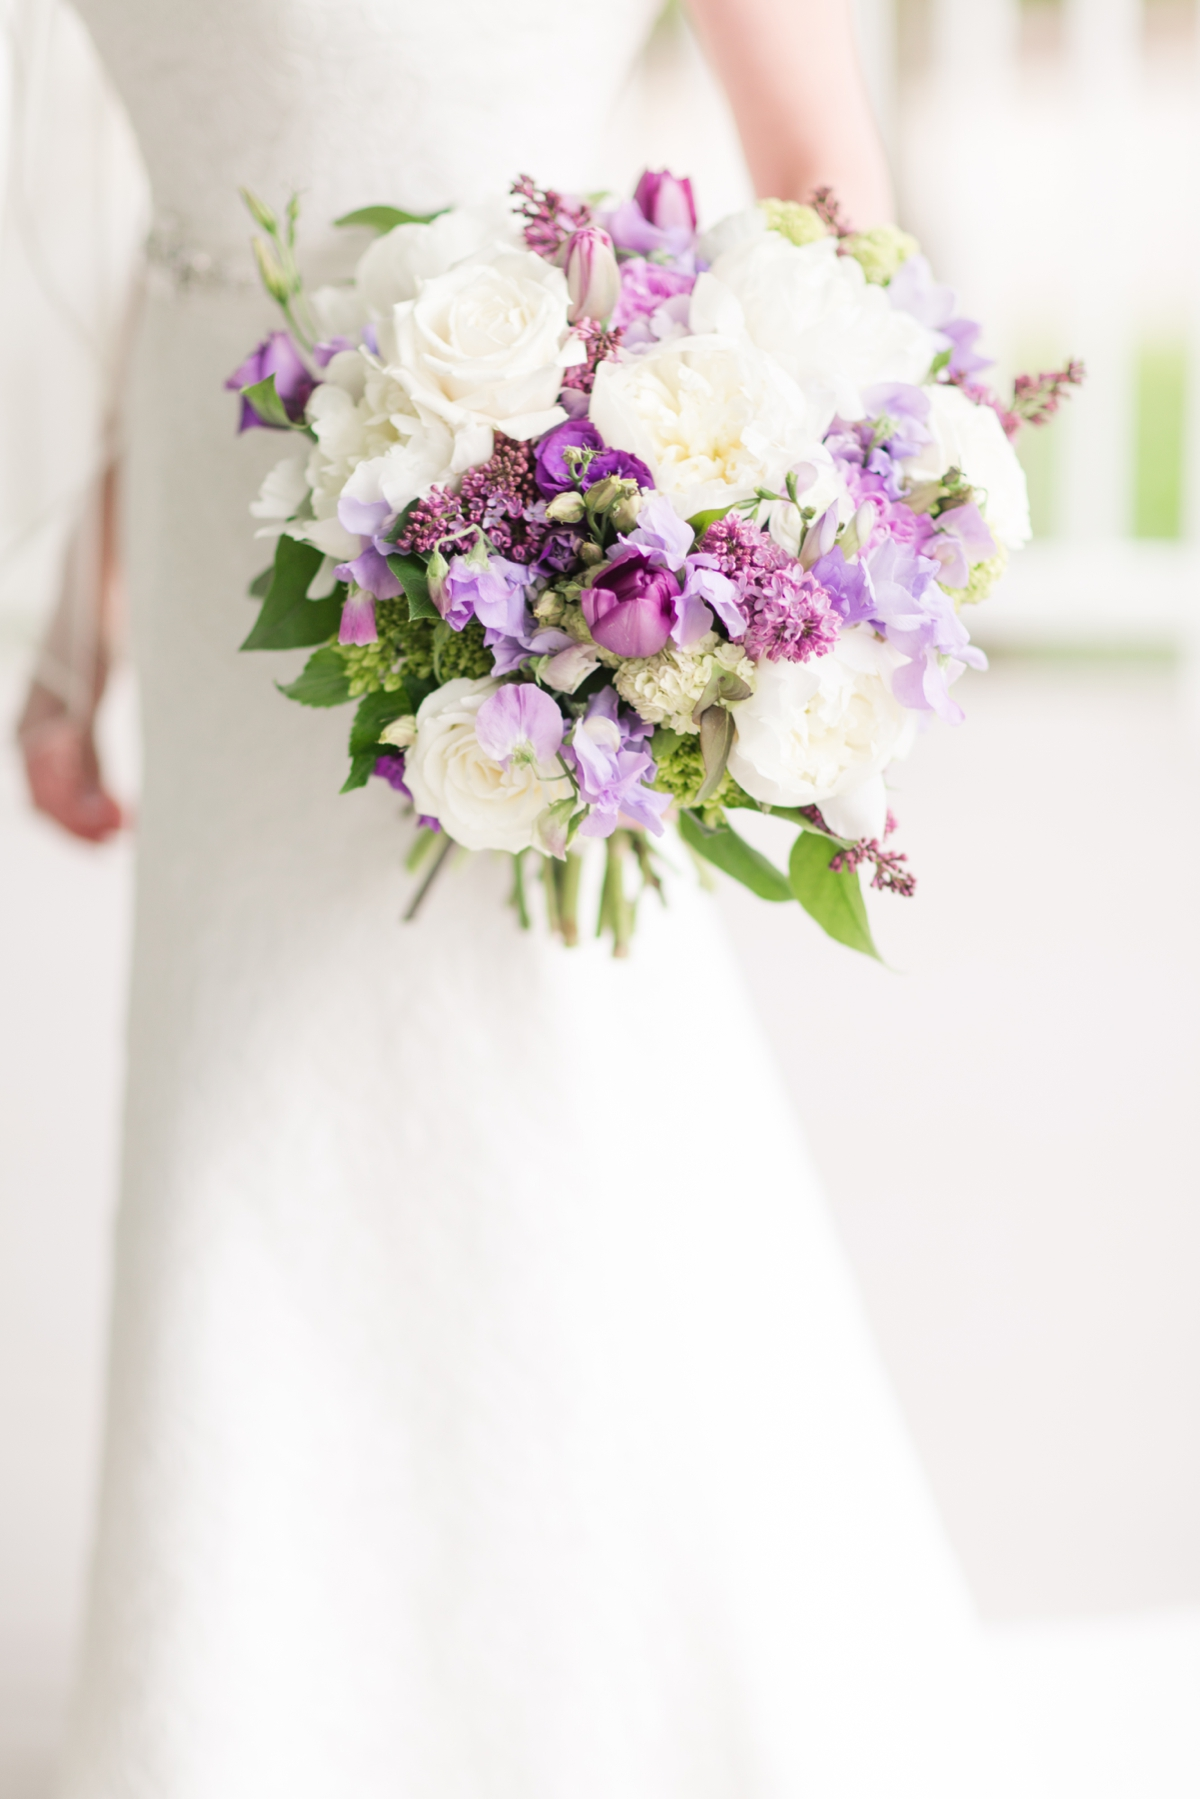 whitehall manor spring wedding Loundon county weddings photo_9783